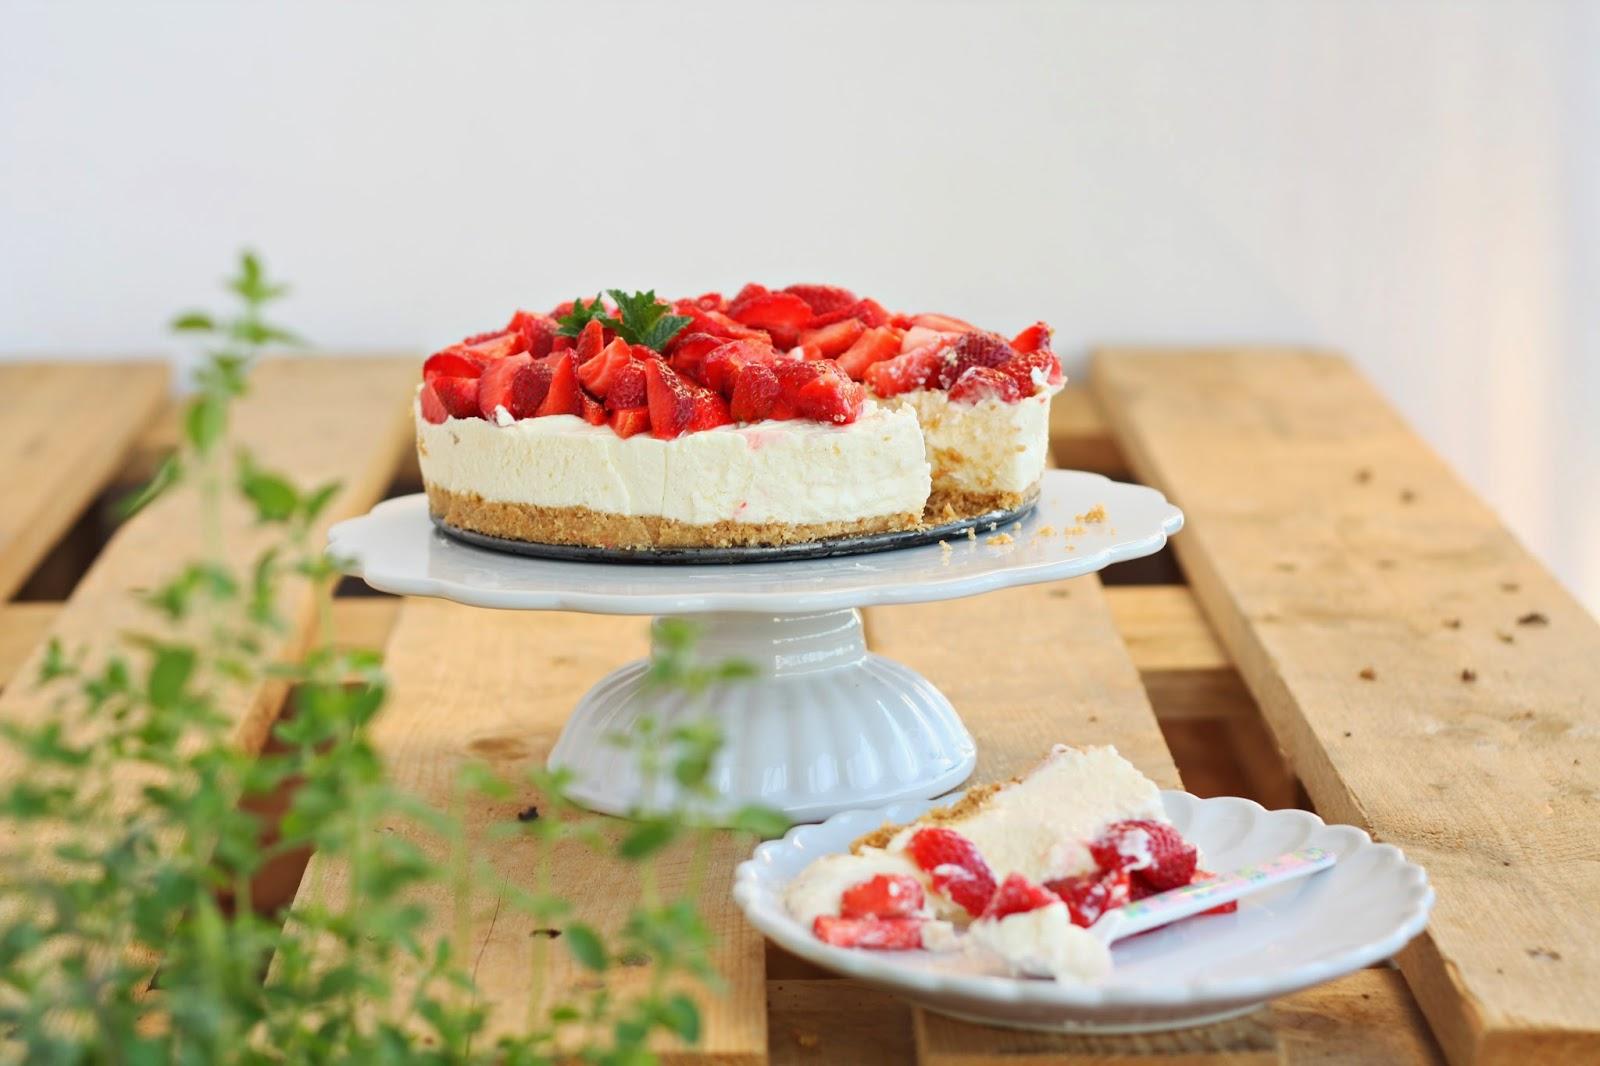 http://sweetvillage.pl/kuchnia/ceramika/patera-ceramiczna-mynte-pure-white-ib-laursen-detail